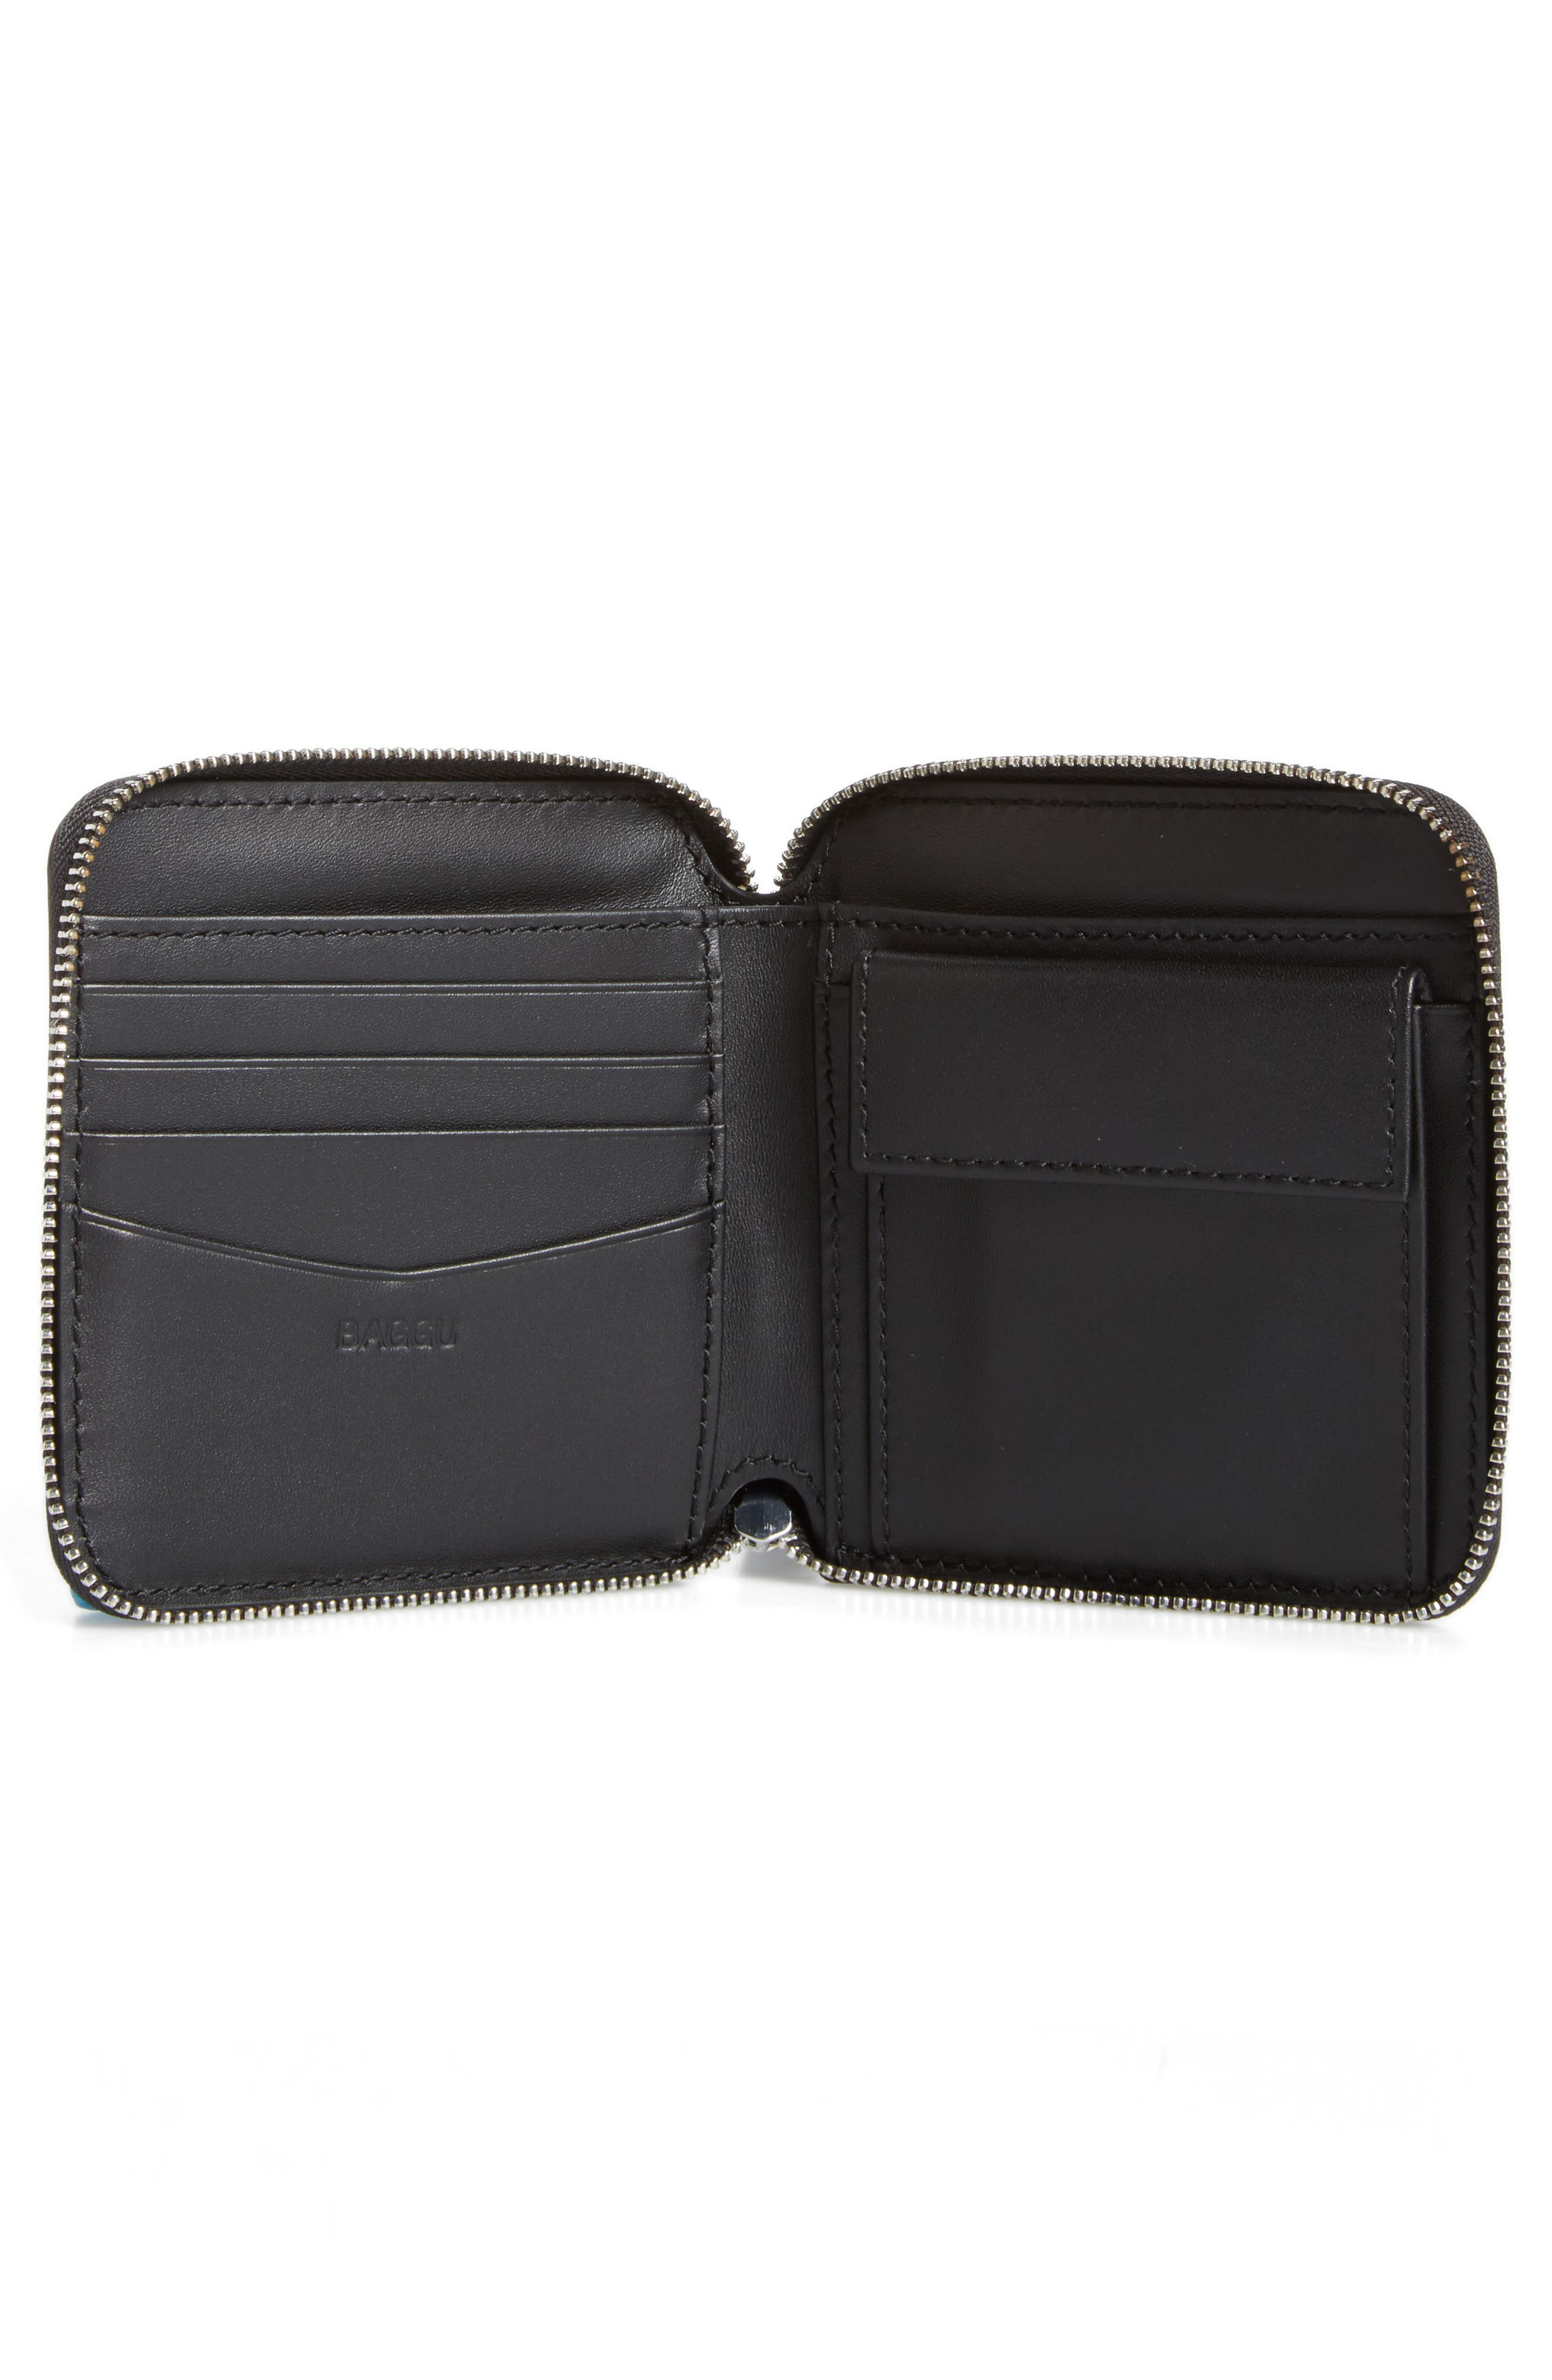 BAGGU,                             Zip Around Square Leather Wallet,                             Alternate thumbnail 2, color,                             001